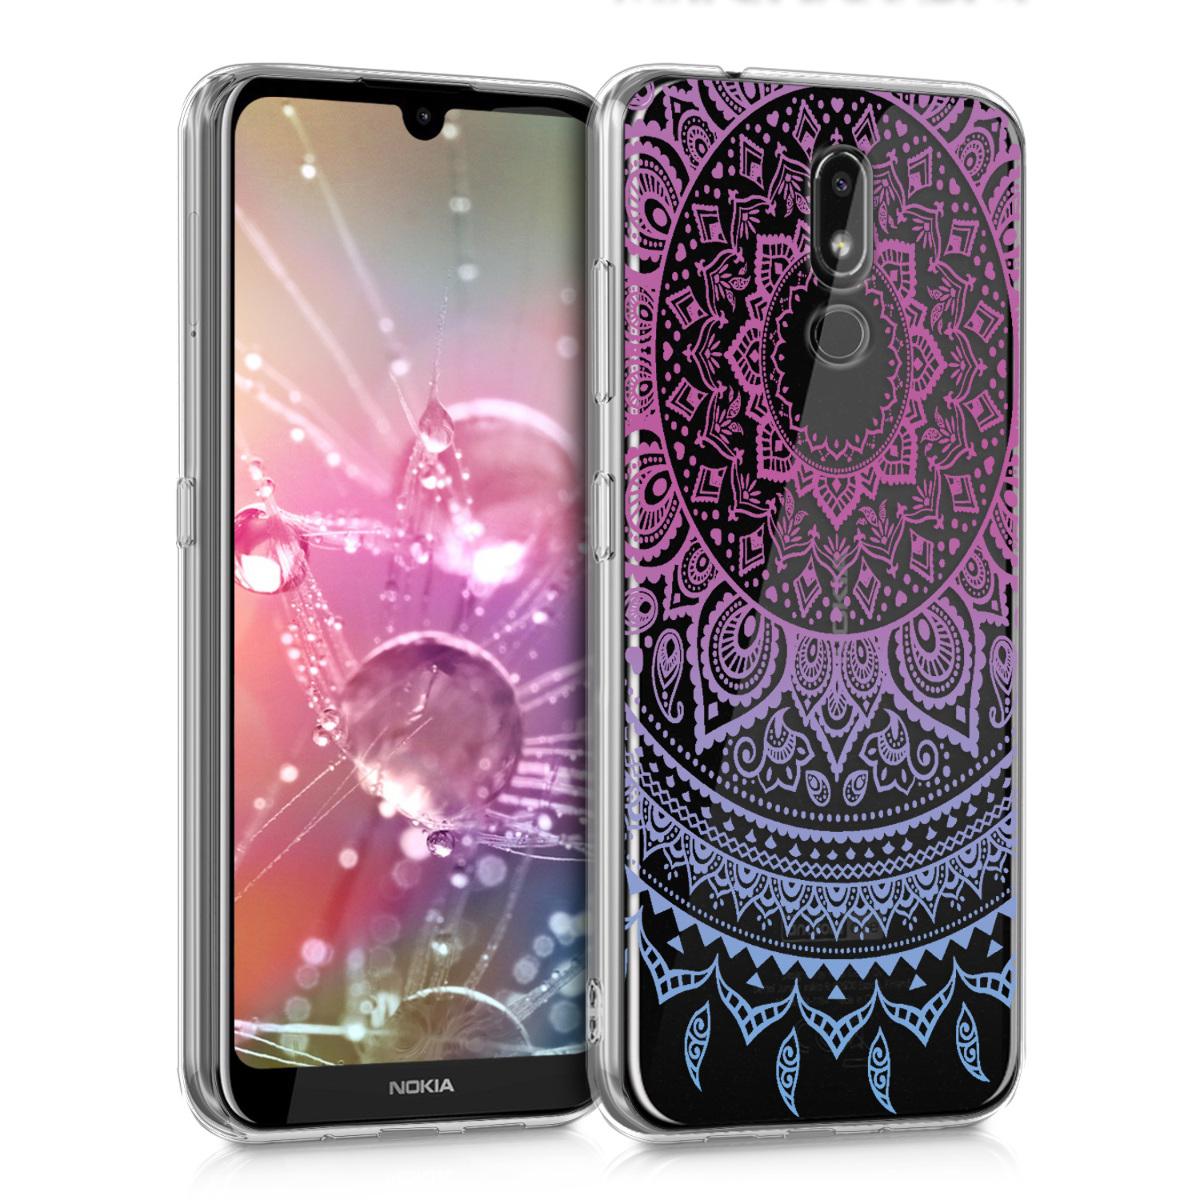 KW Θήκη Σιλικόνης Nokia 3.2 - Crystal Clear - Blue / Dark Pink / Transparent (48015.03)